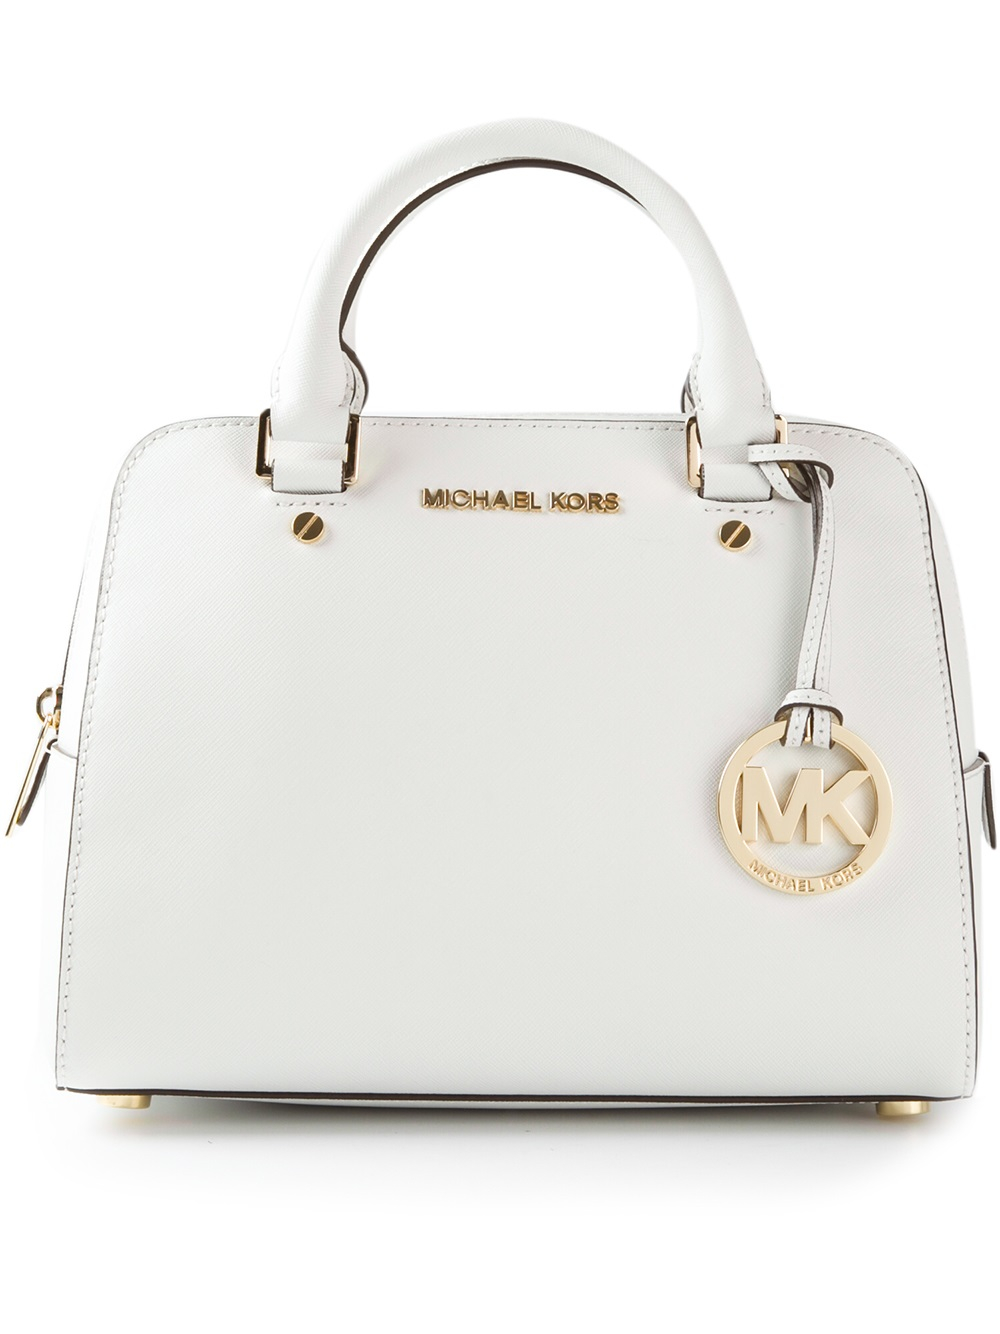 ed37618ba9673 ... order lyst michael kors mini bowling bag in white 8c8d6 a512a